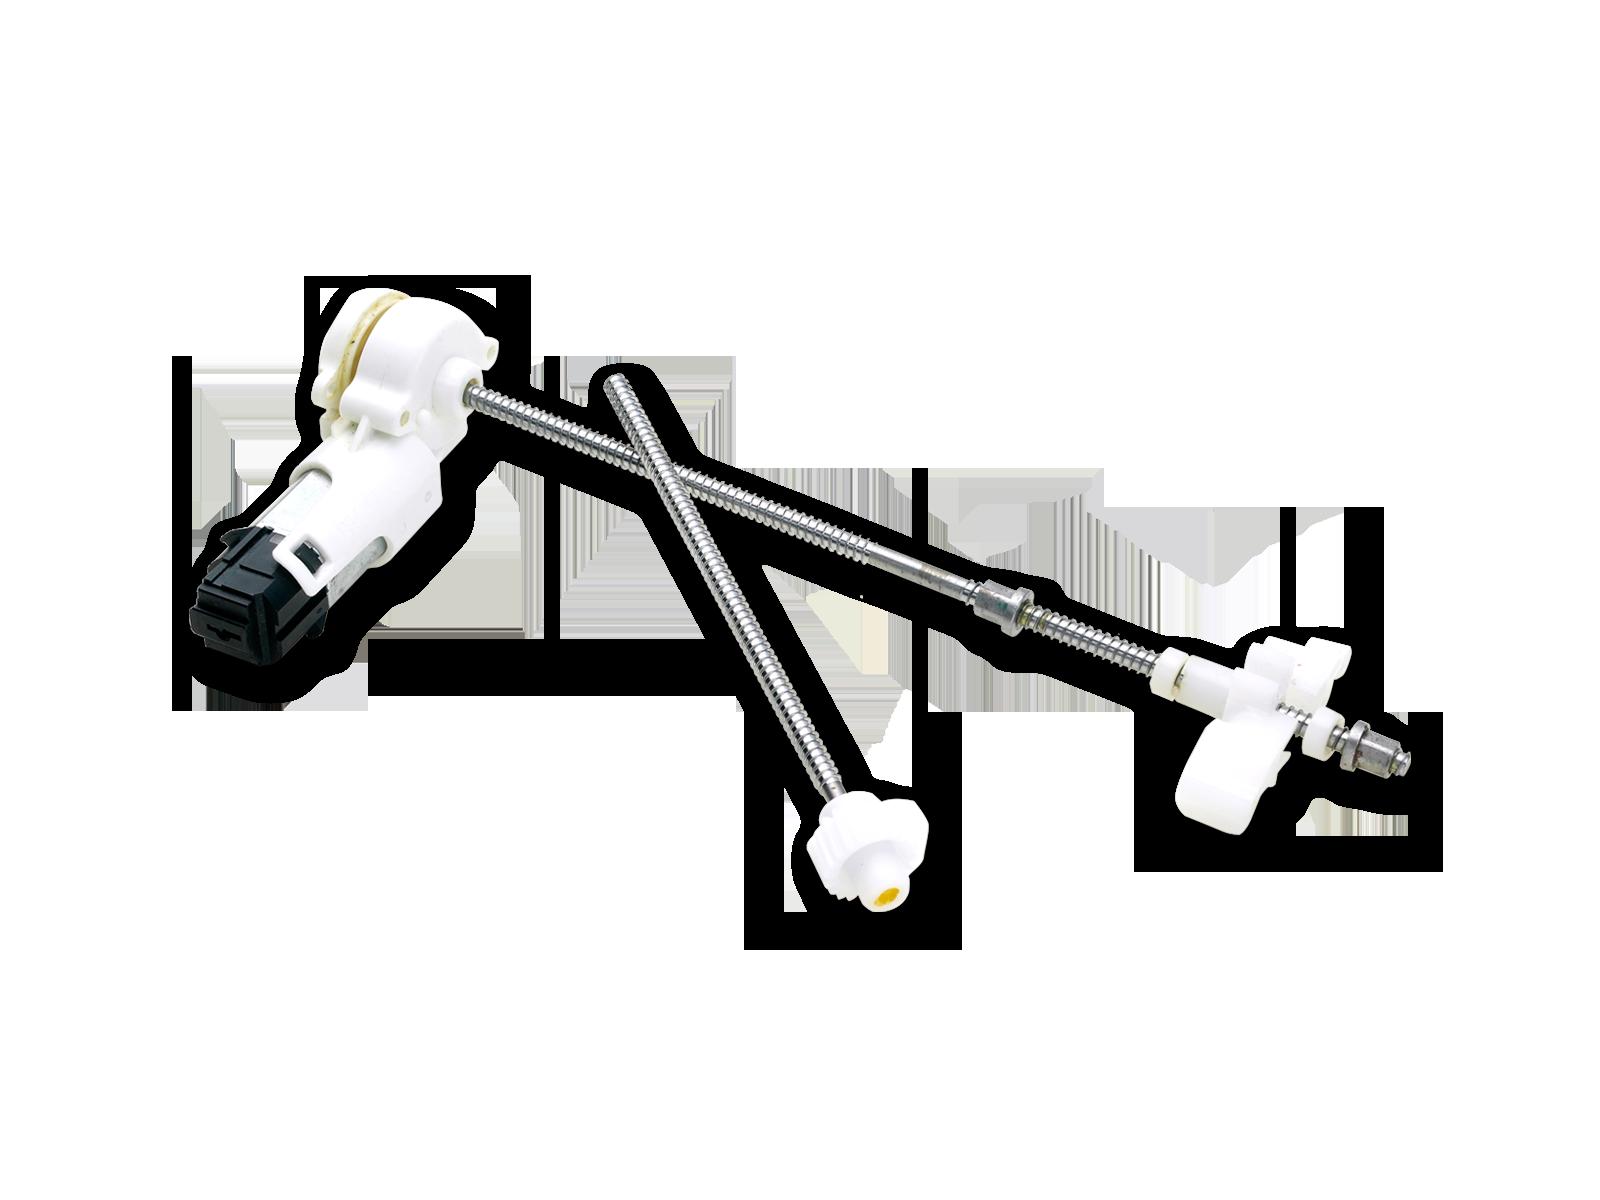 - High Quality Rolling Parts - Backrest shape adjusts ( Brose ) - 2,500,000pcs/yr Capacity - Rolling & Machining